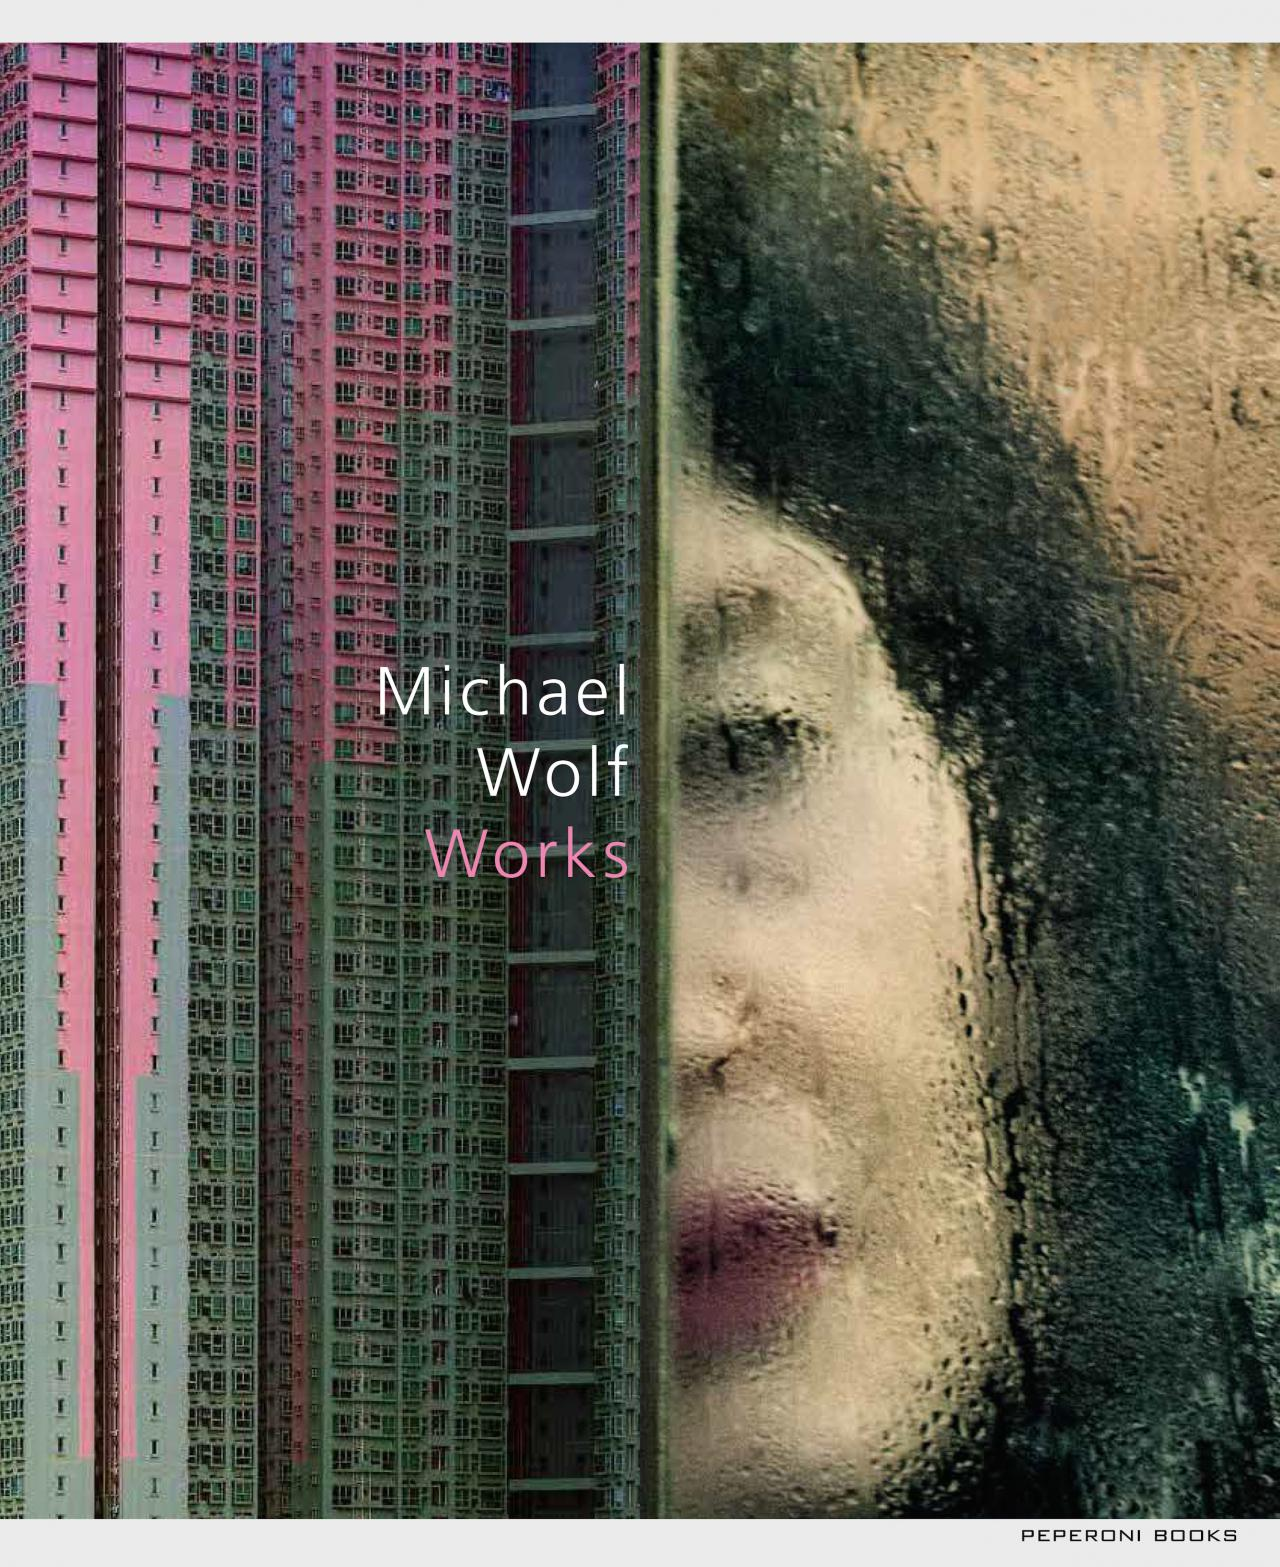 Michael Wolf: Works